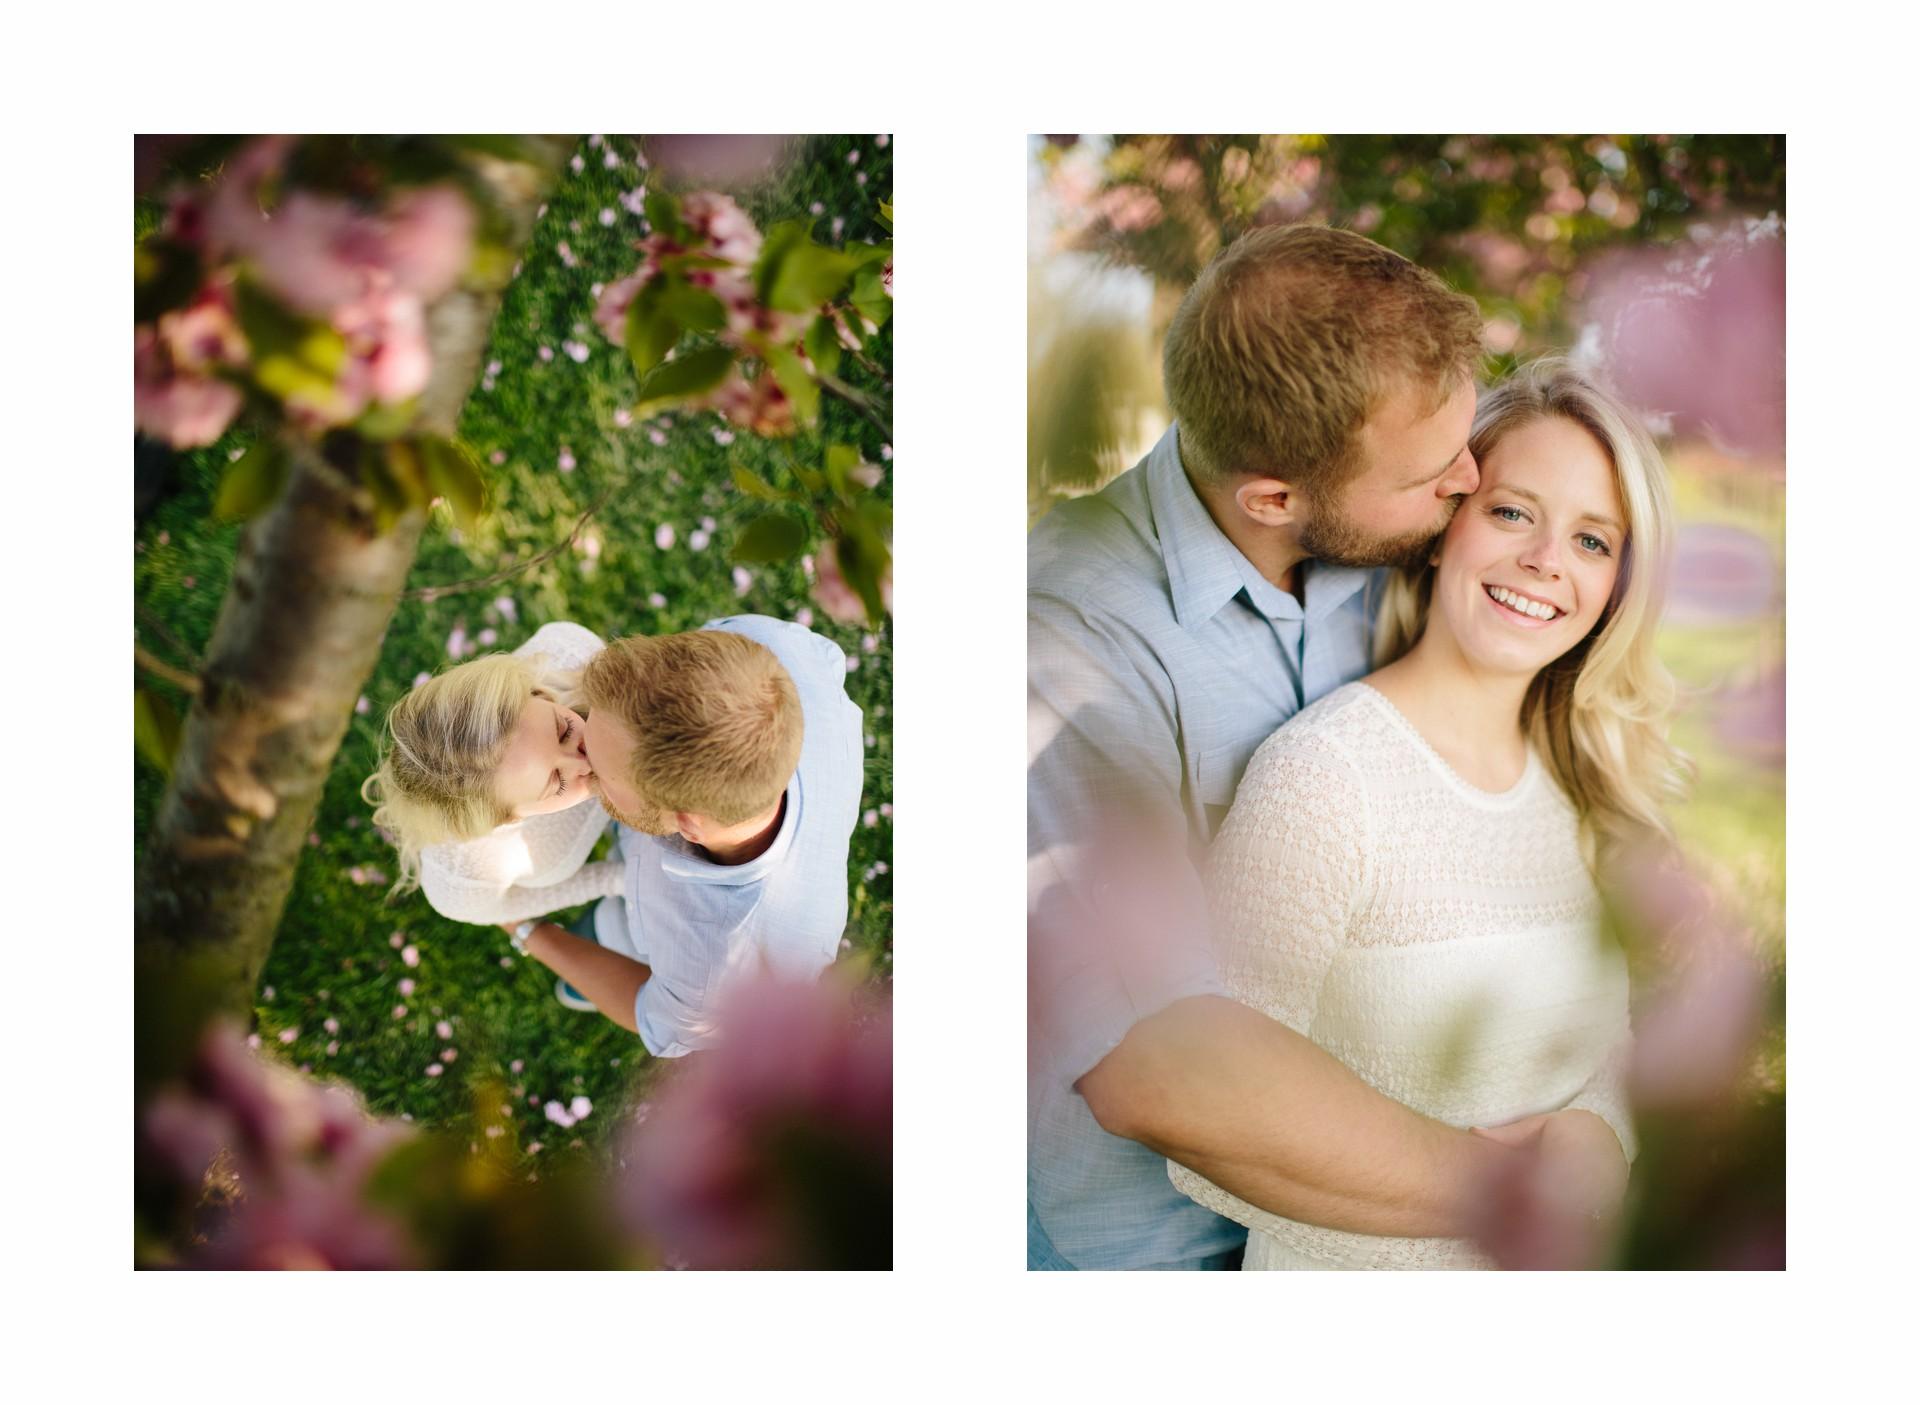 Cleveland Wedding and Engagement Photos 4.jpg